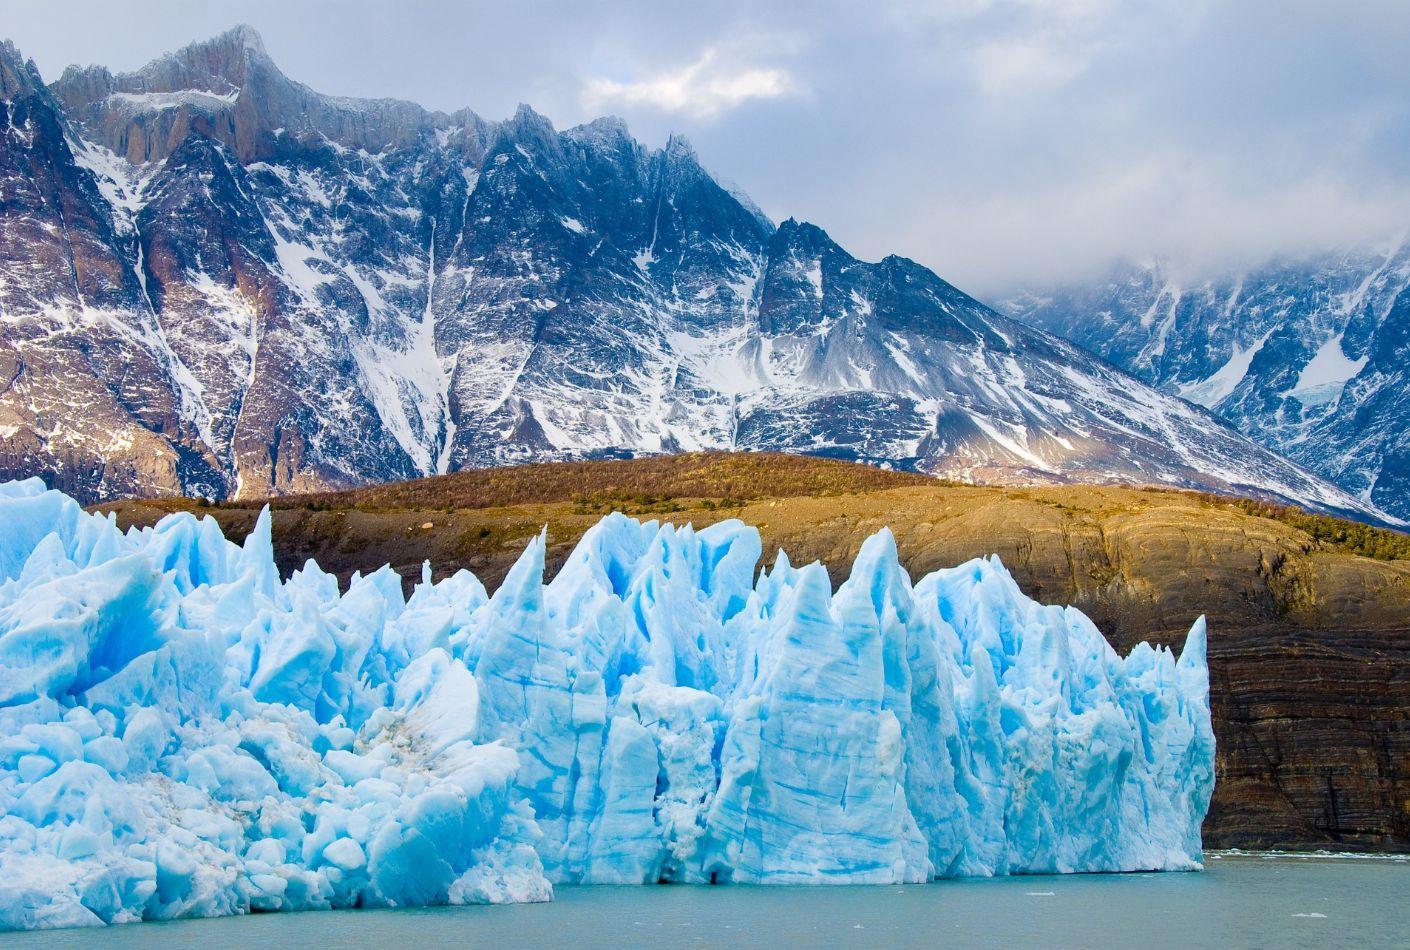 Glaciar en Chile. Oferta viaje a la Patagonia.